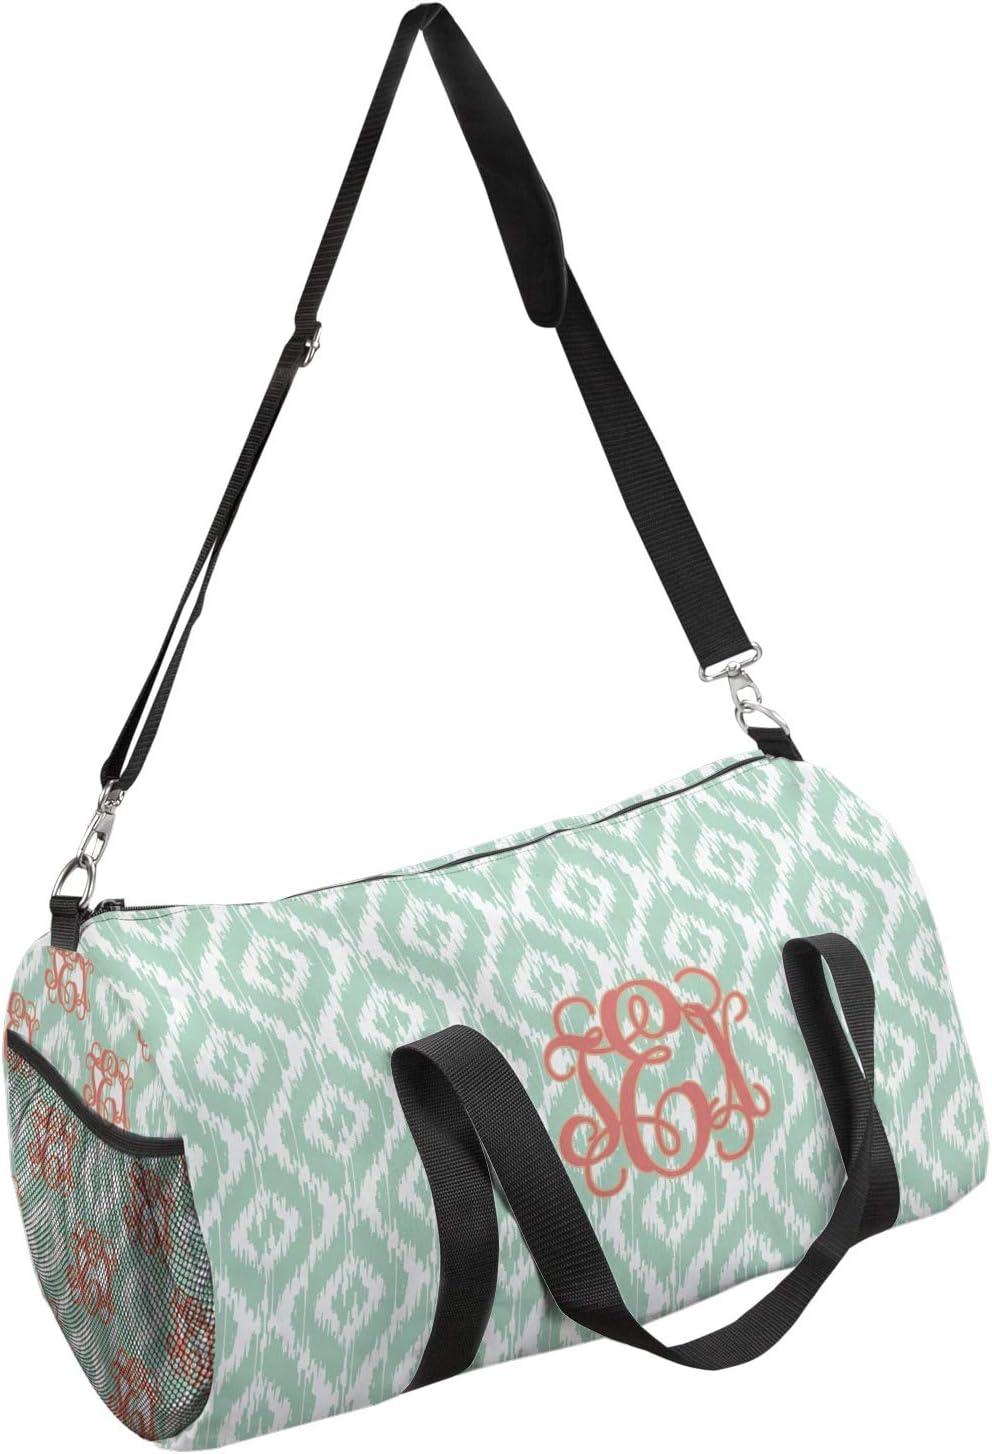 Personalized YouCustomizeIt Monogram Duffel Bag